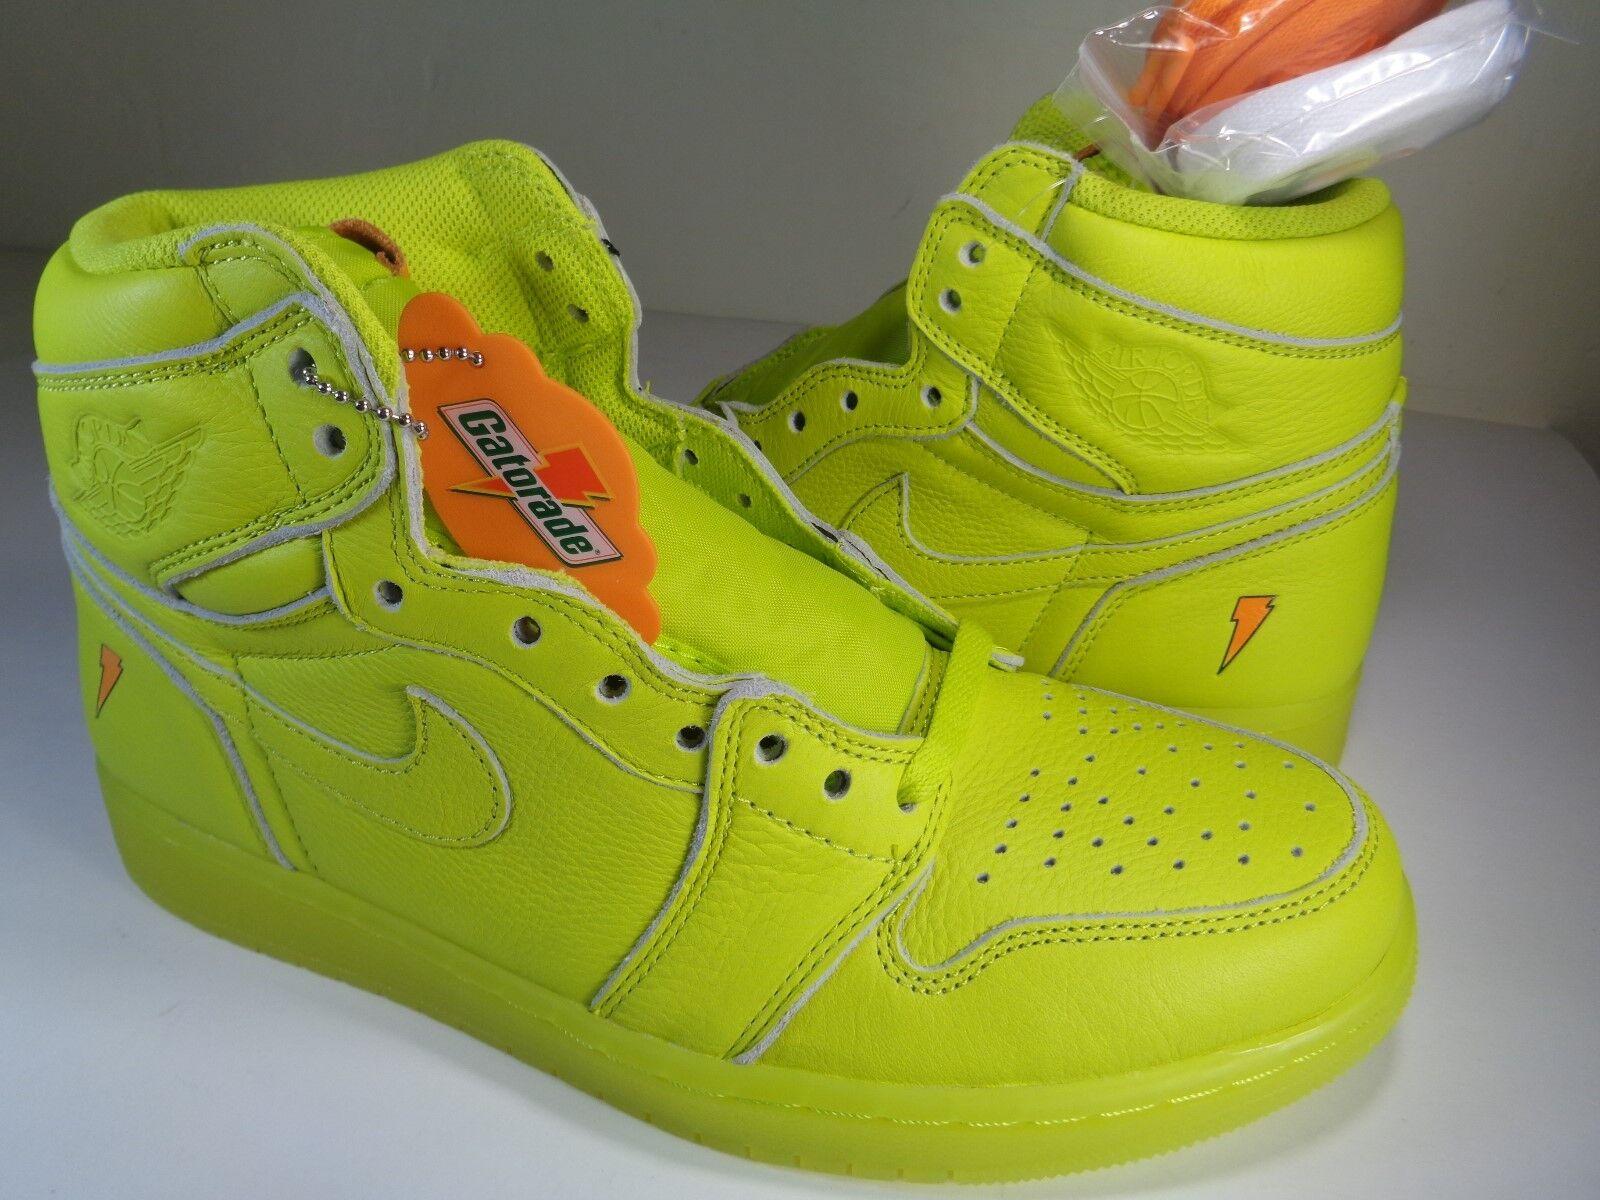 Nike Air Jordan 1 Retro High OG Gatorade Cyber Yellow Lime SZ 9.5 (AJ5997-345)